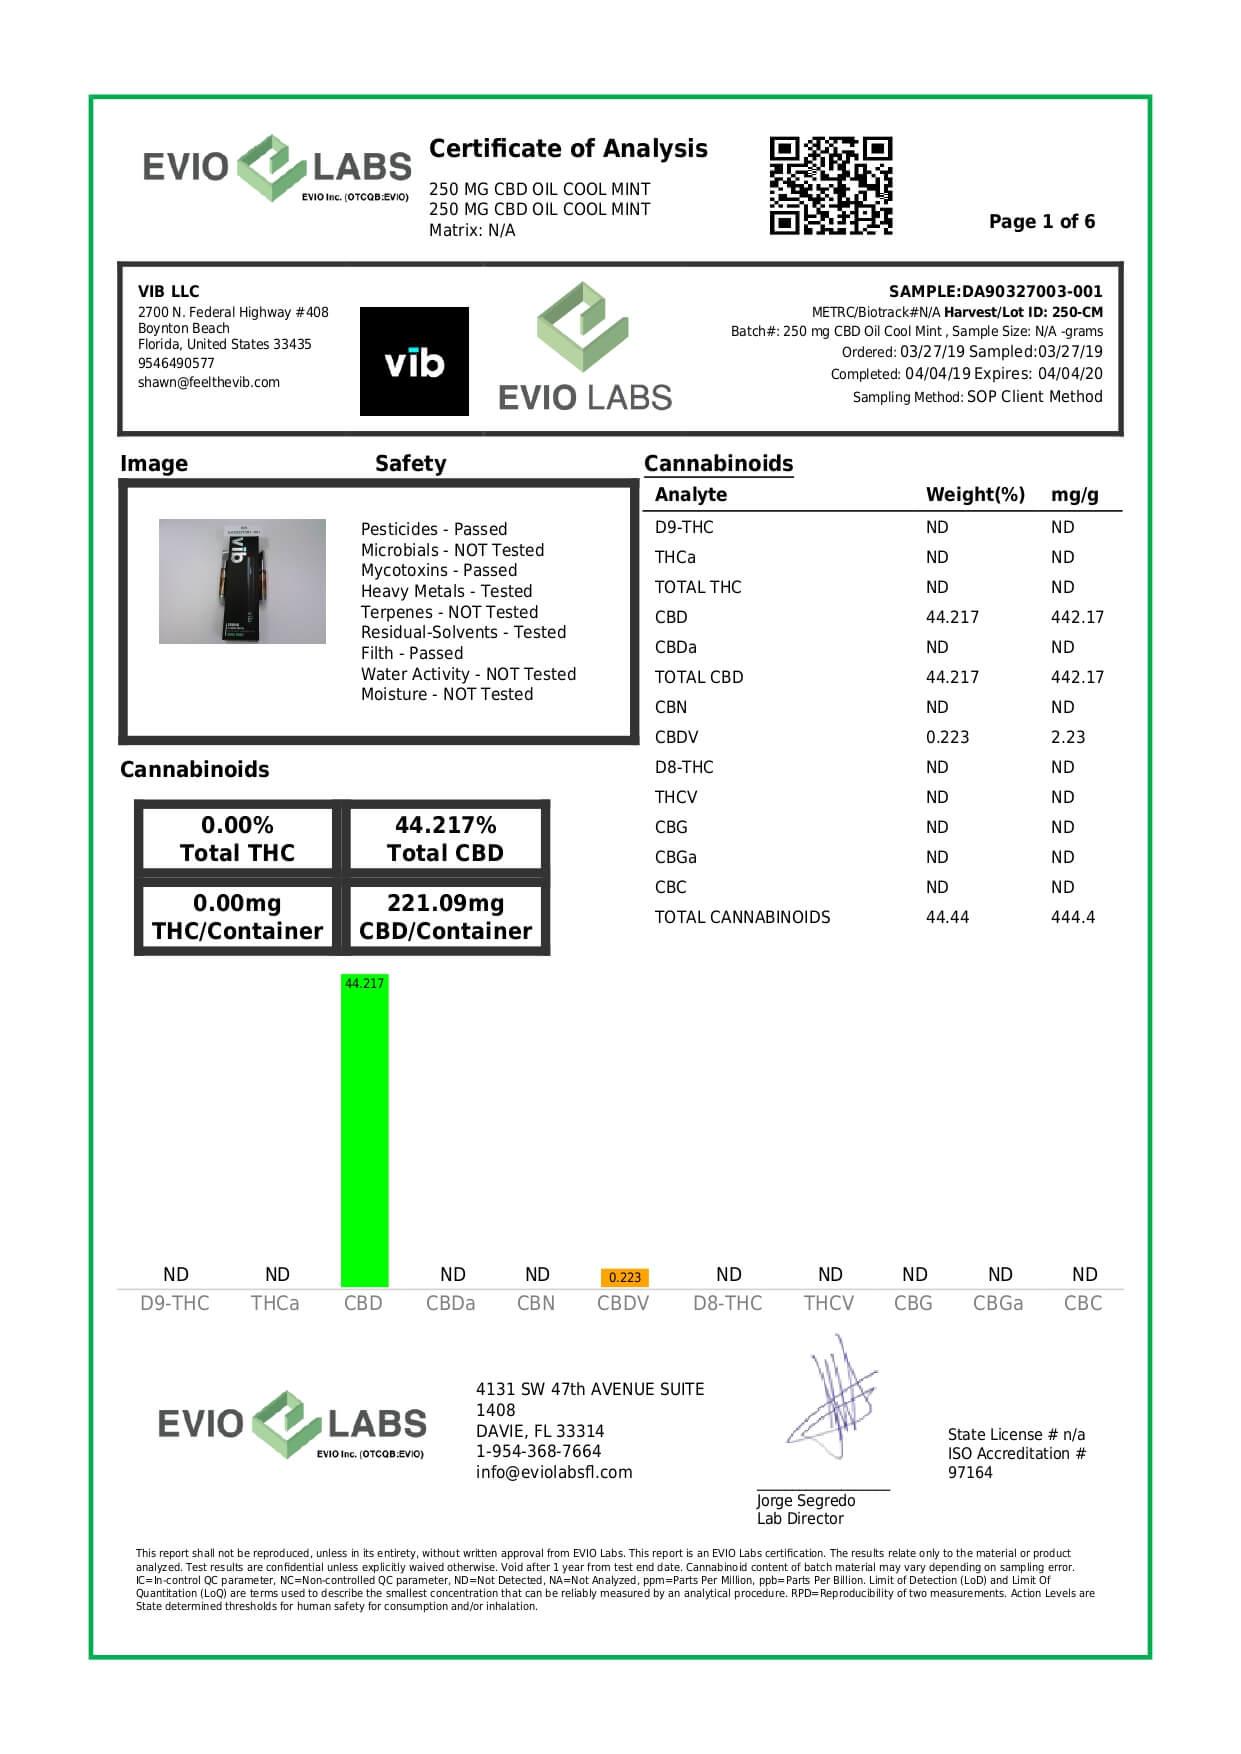 vīb CBD Device Cool Mint Awaken Disposable Vape Pen Lab Report